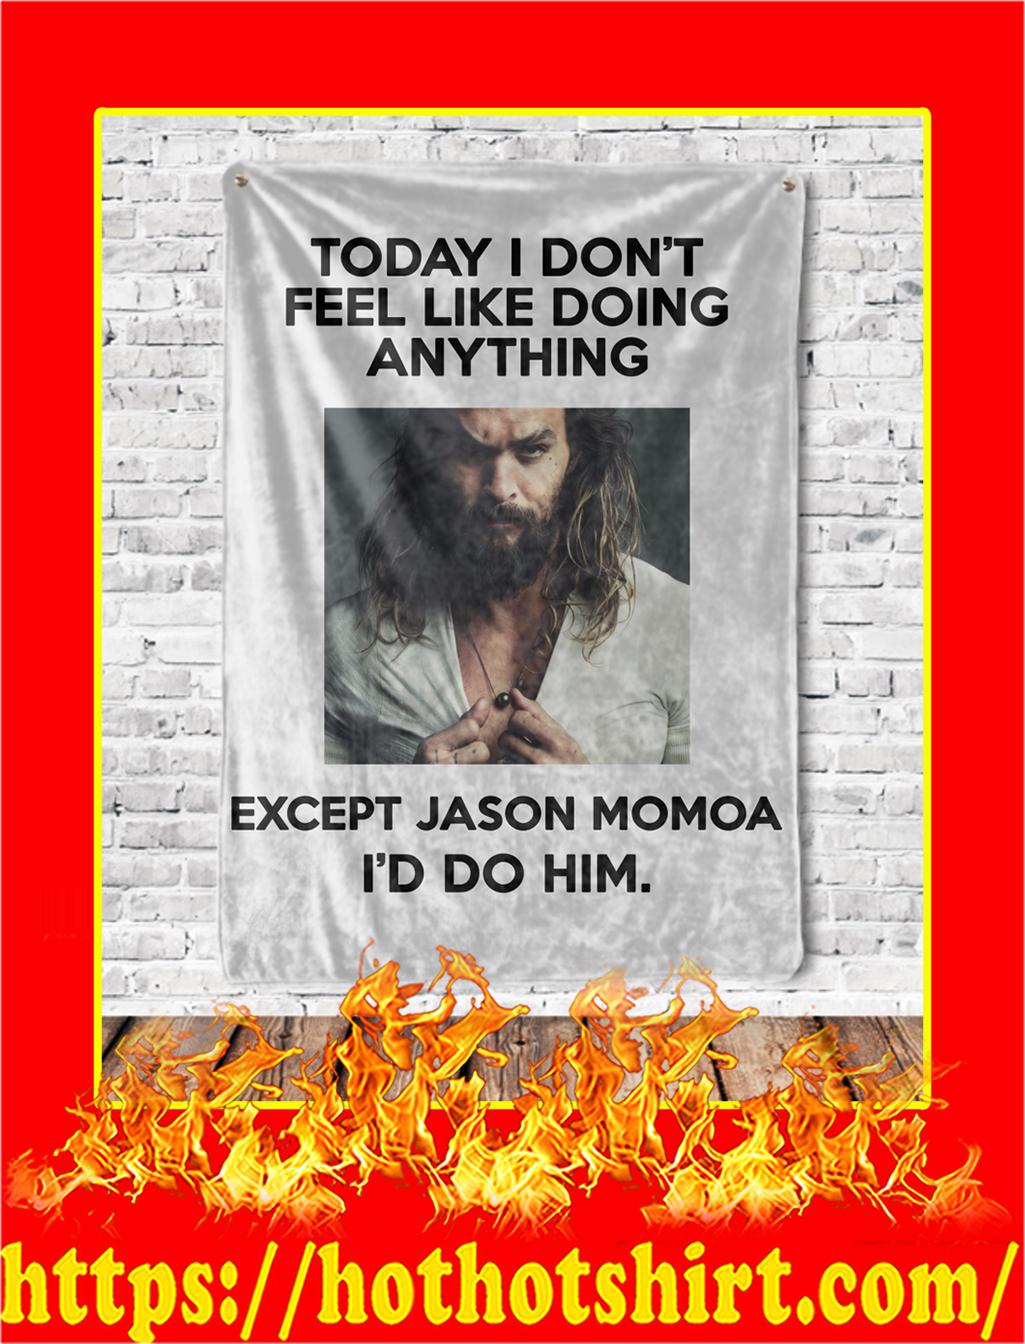 Jason Momoa Today I Don't Feel Like Doing Anything Blanket- 60x80